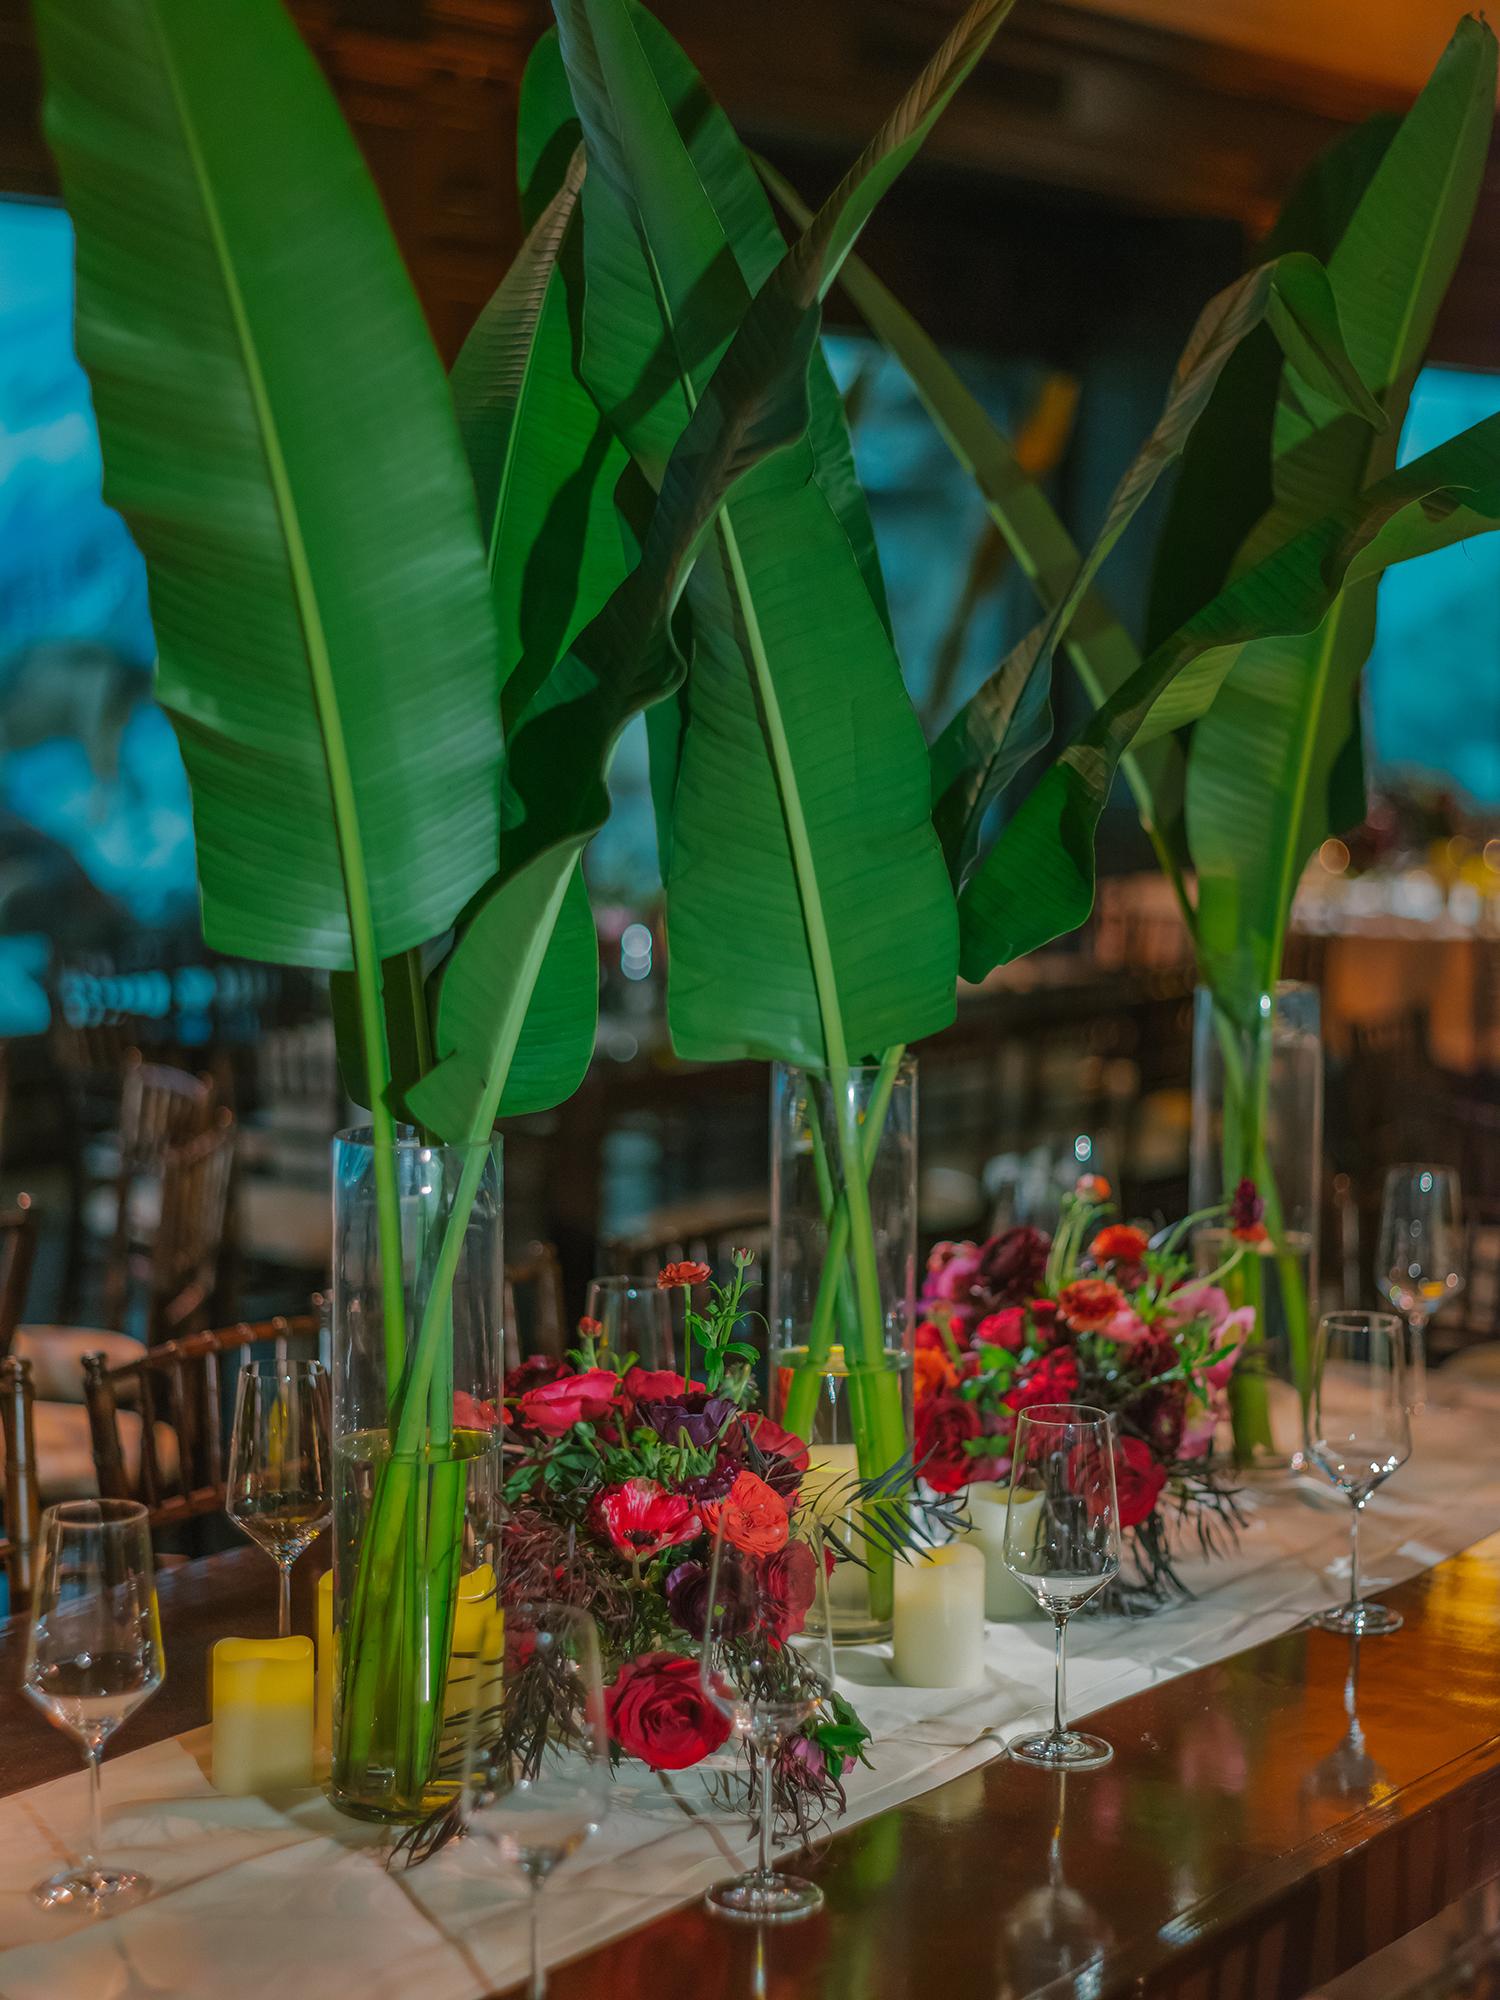 duff goldman johnna colbry wedding centerpieces with banana leaves